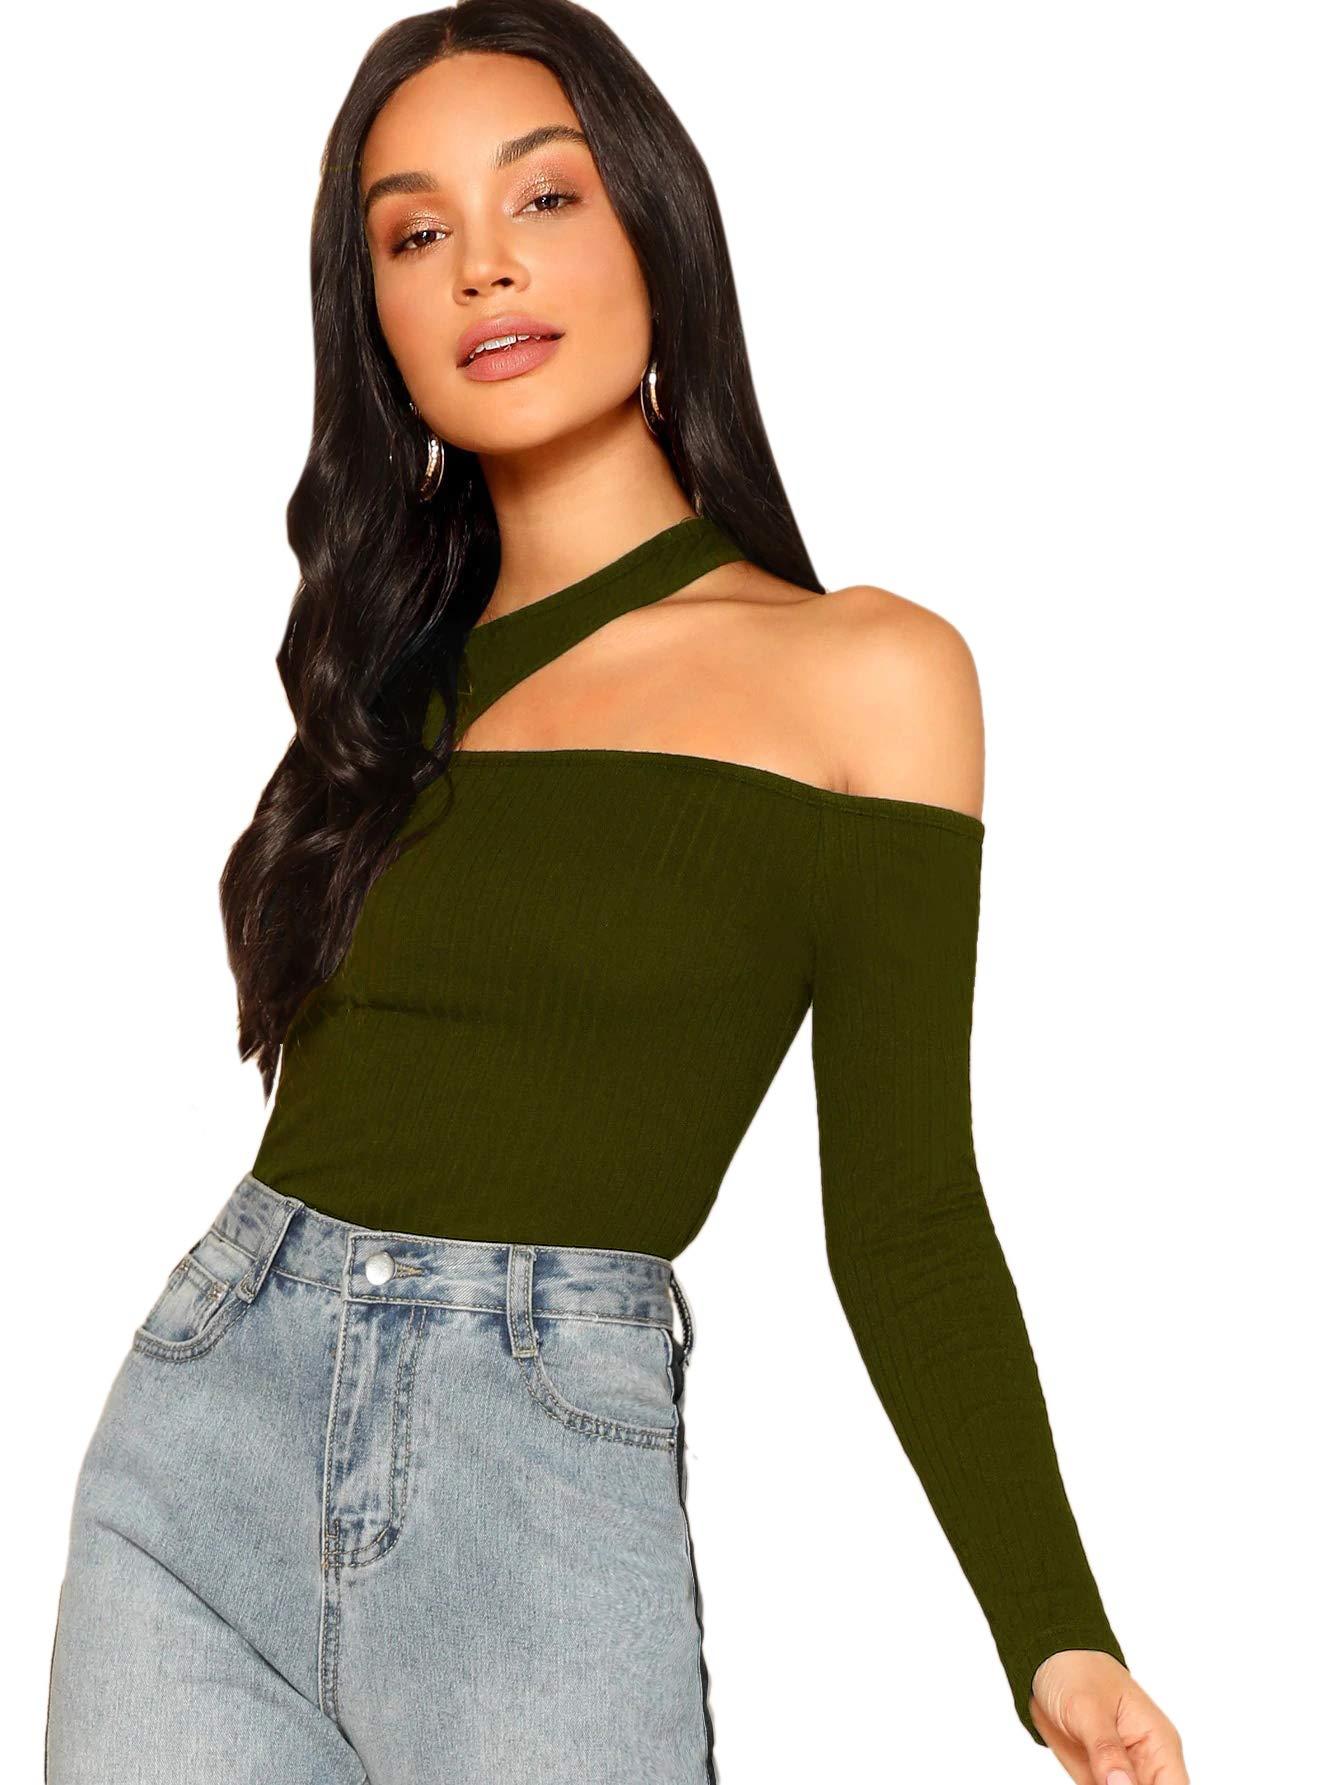 Romwe Women's Sexy Asymmetric Cutout Neck Ribbed Casual T-Shirt Tops